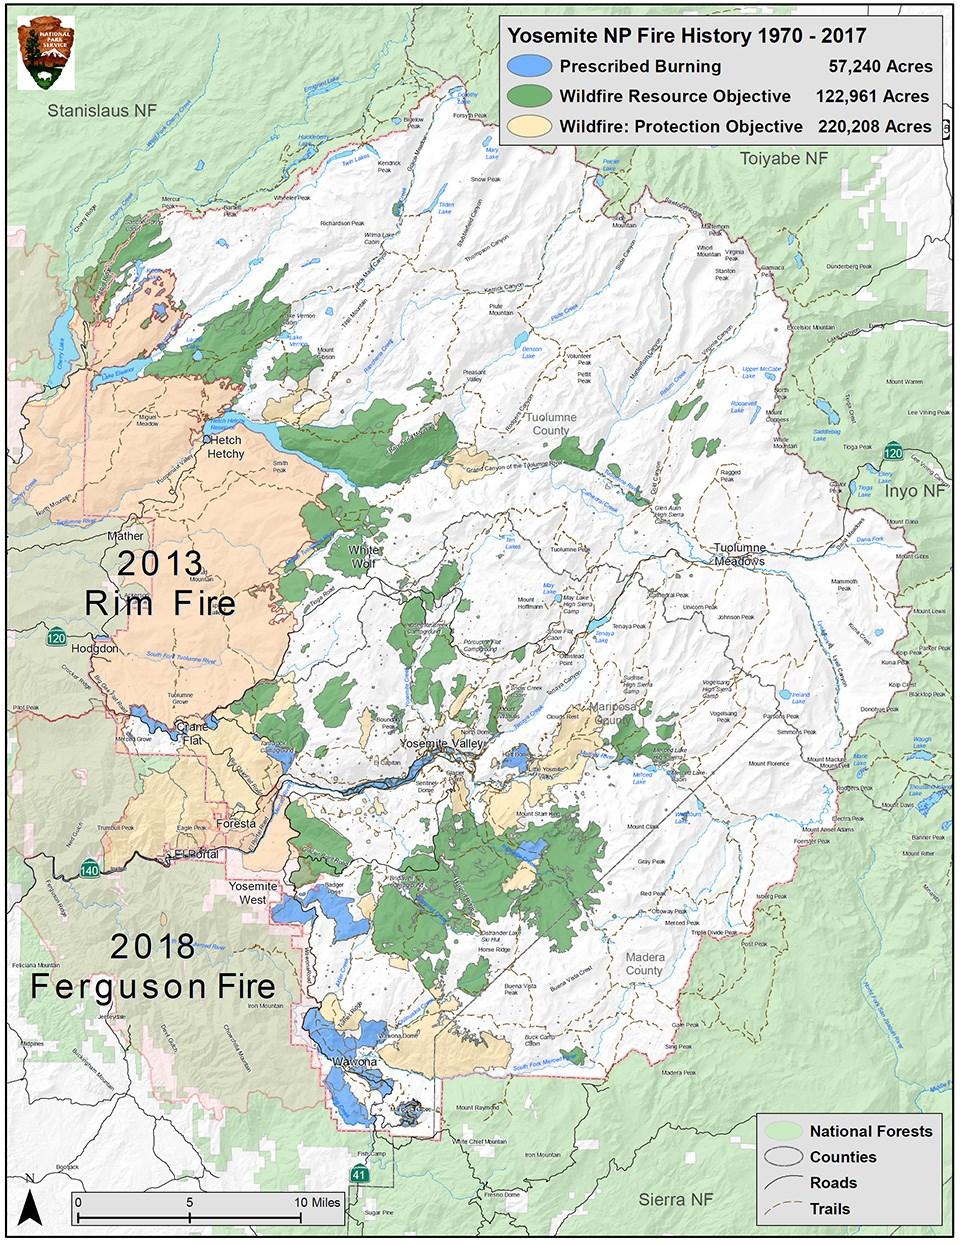 Valley Of Fire Map Pdf.Fire History Yosemite National Park U S National Park Service